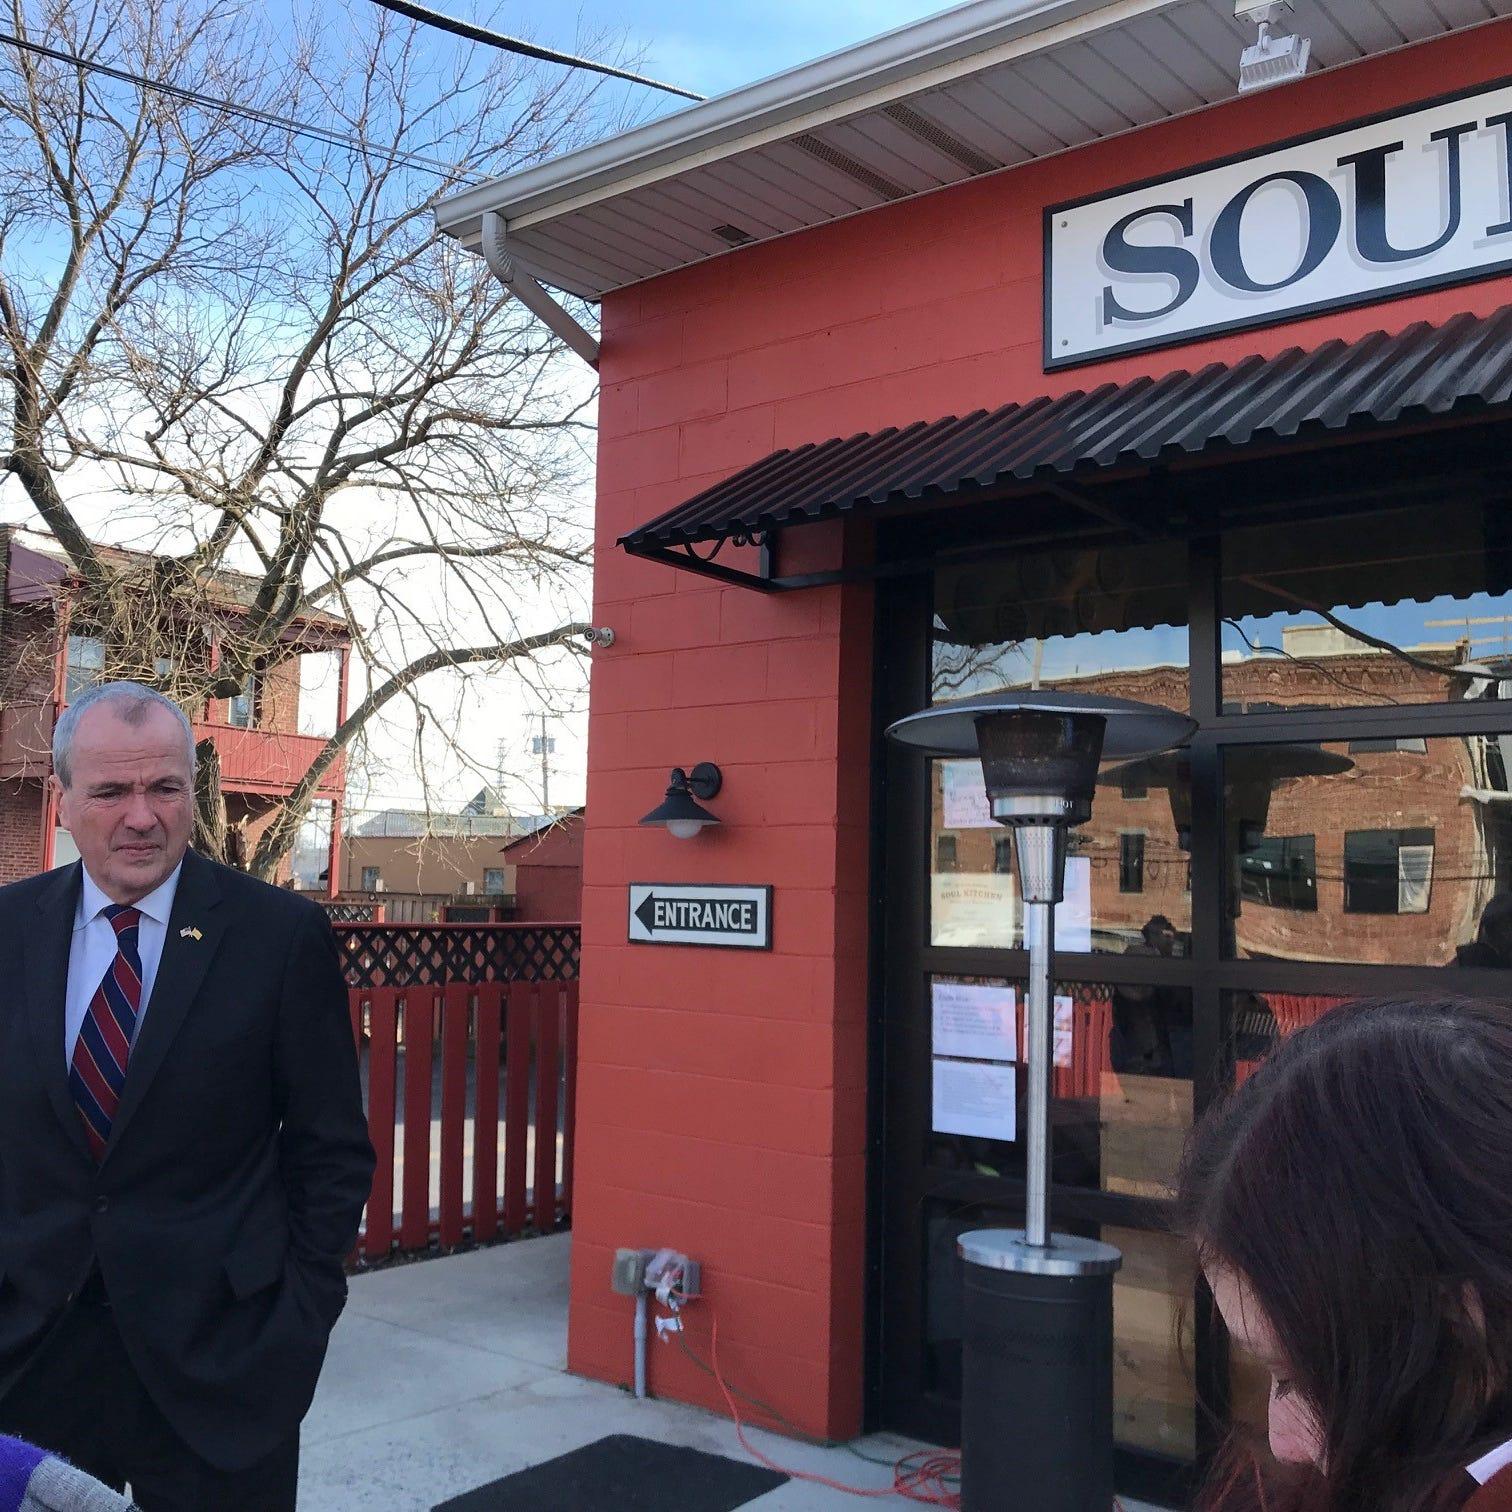 Bon Jovi Soul Kitchen: Gov. Phil Murphy visits furloughed federal workers lunch